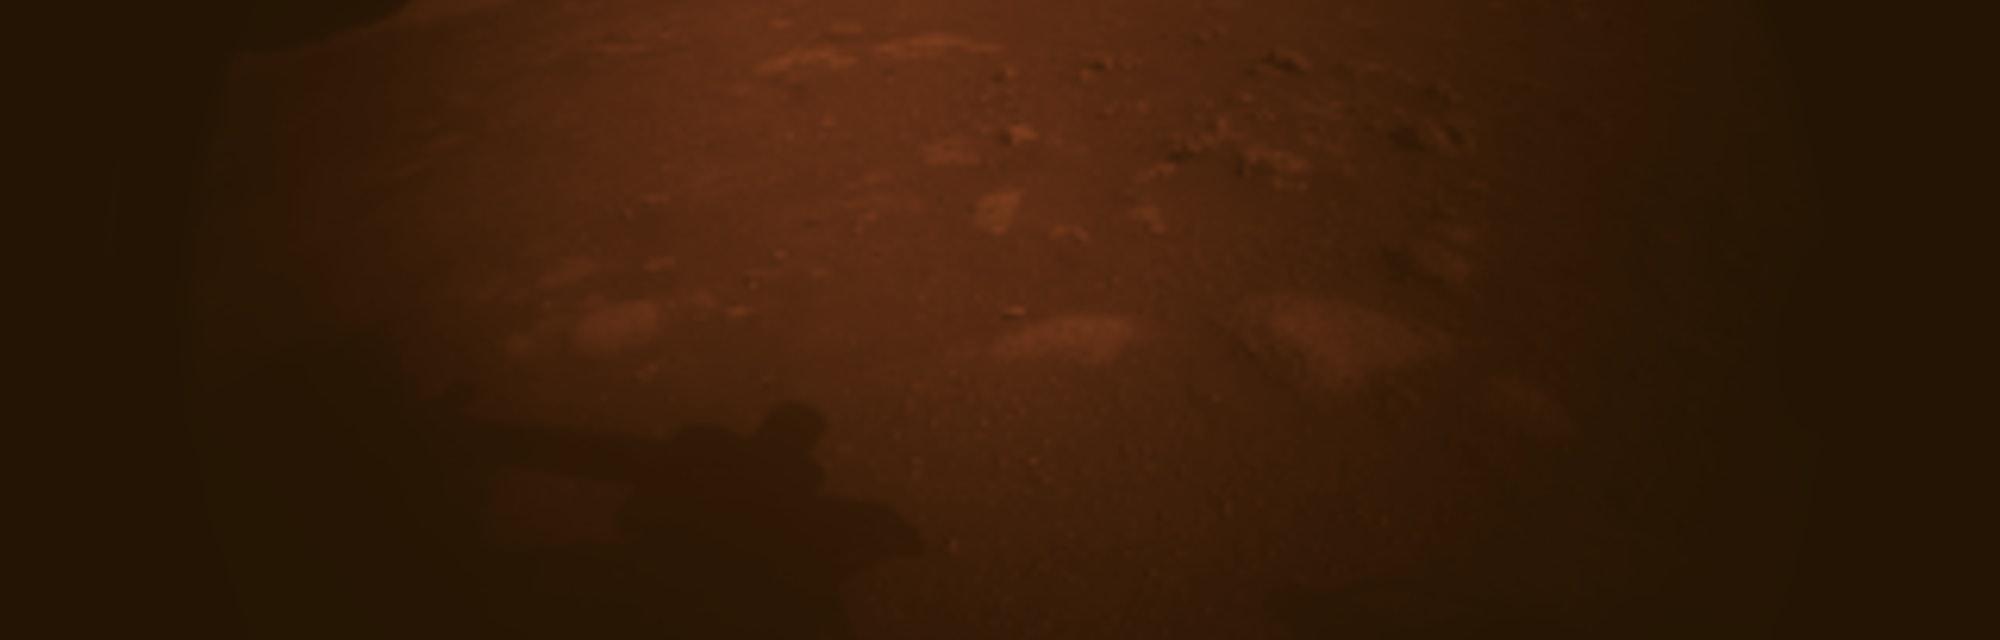 NASA Mars Perseverance photo